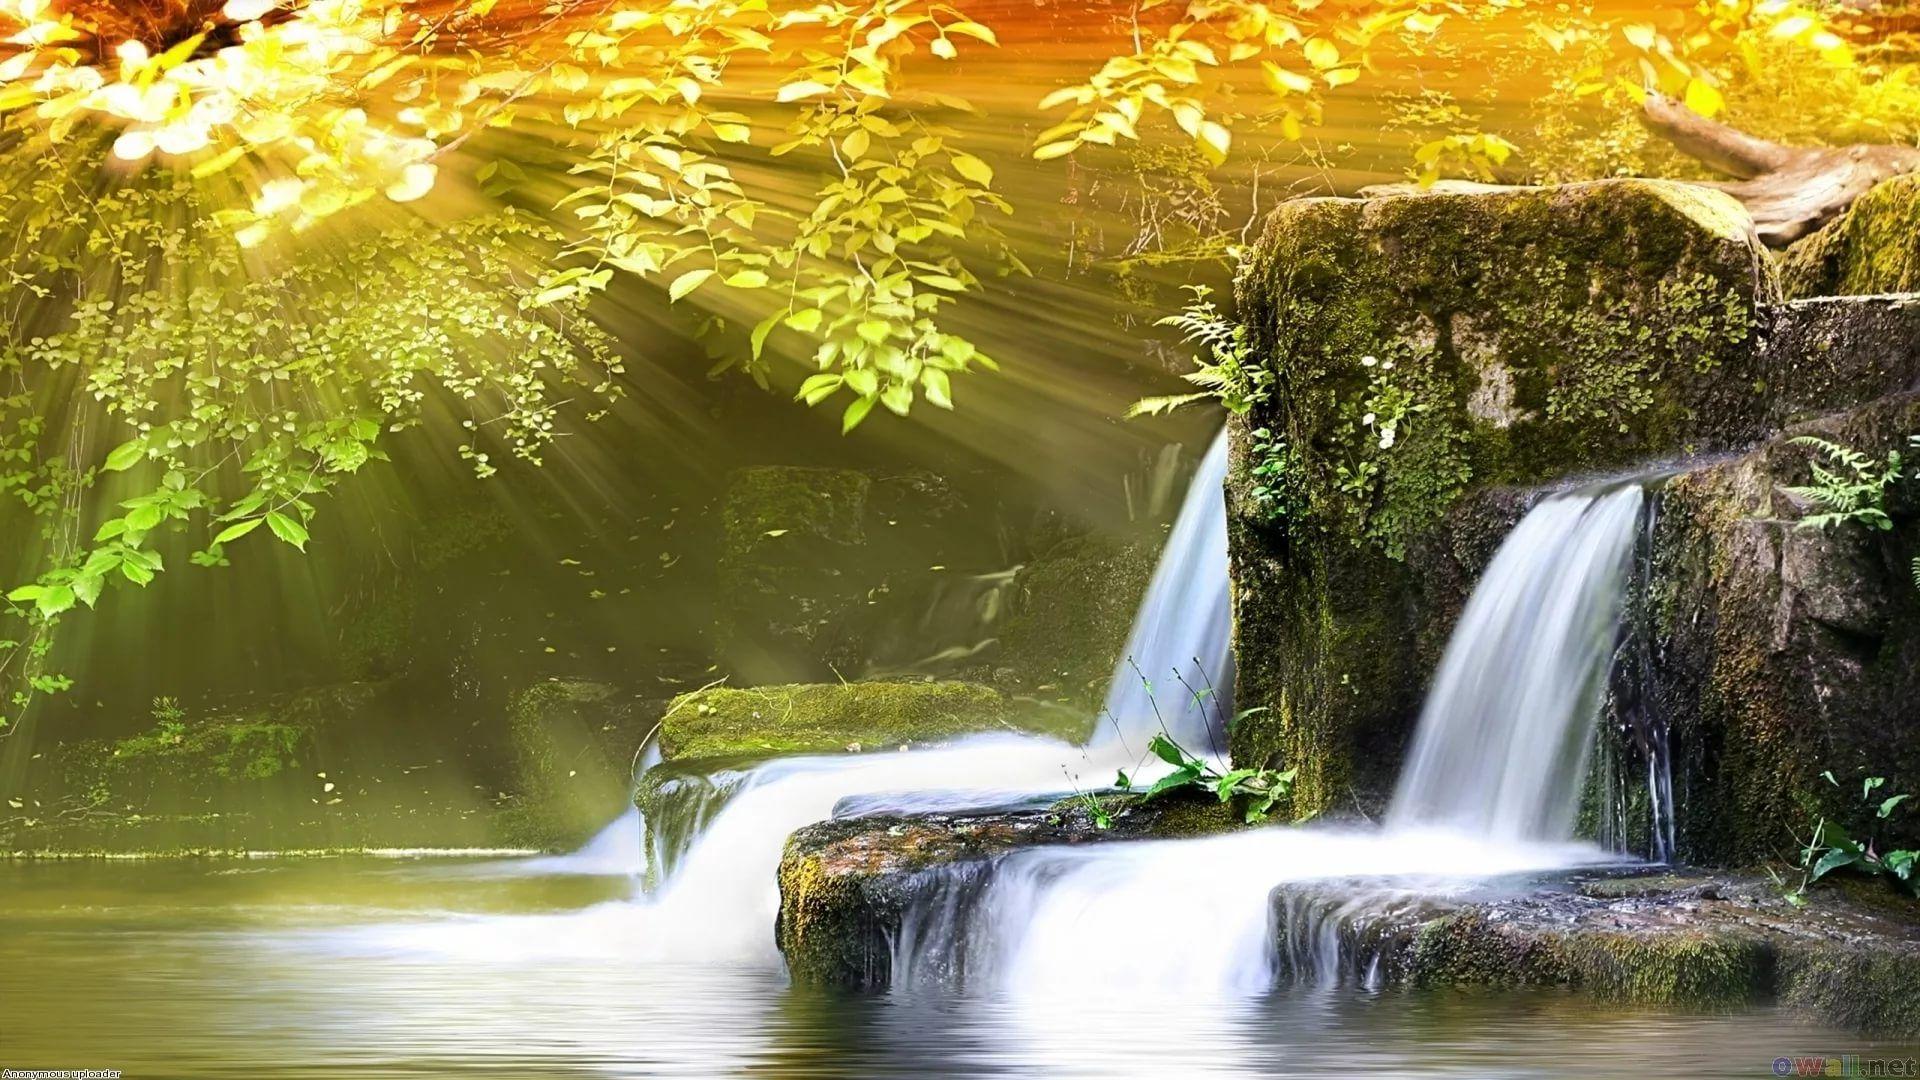 10d Full Hd Wallpaper For Laptop - Nature Background Images For Websites - HD Wallpaper